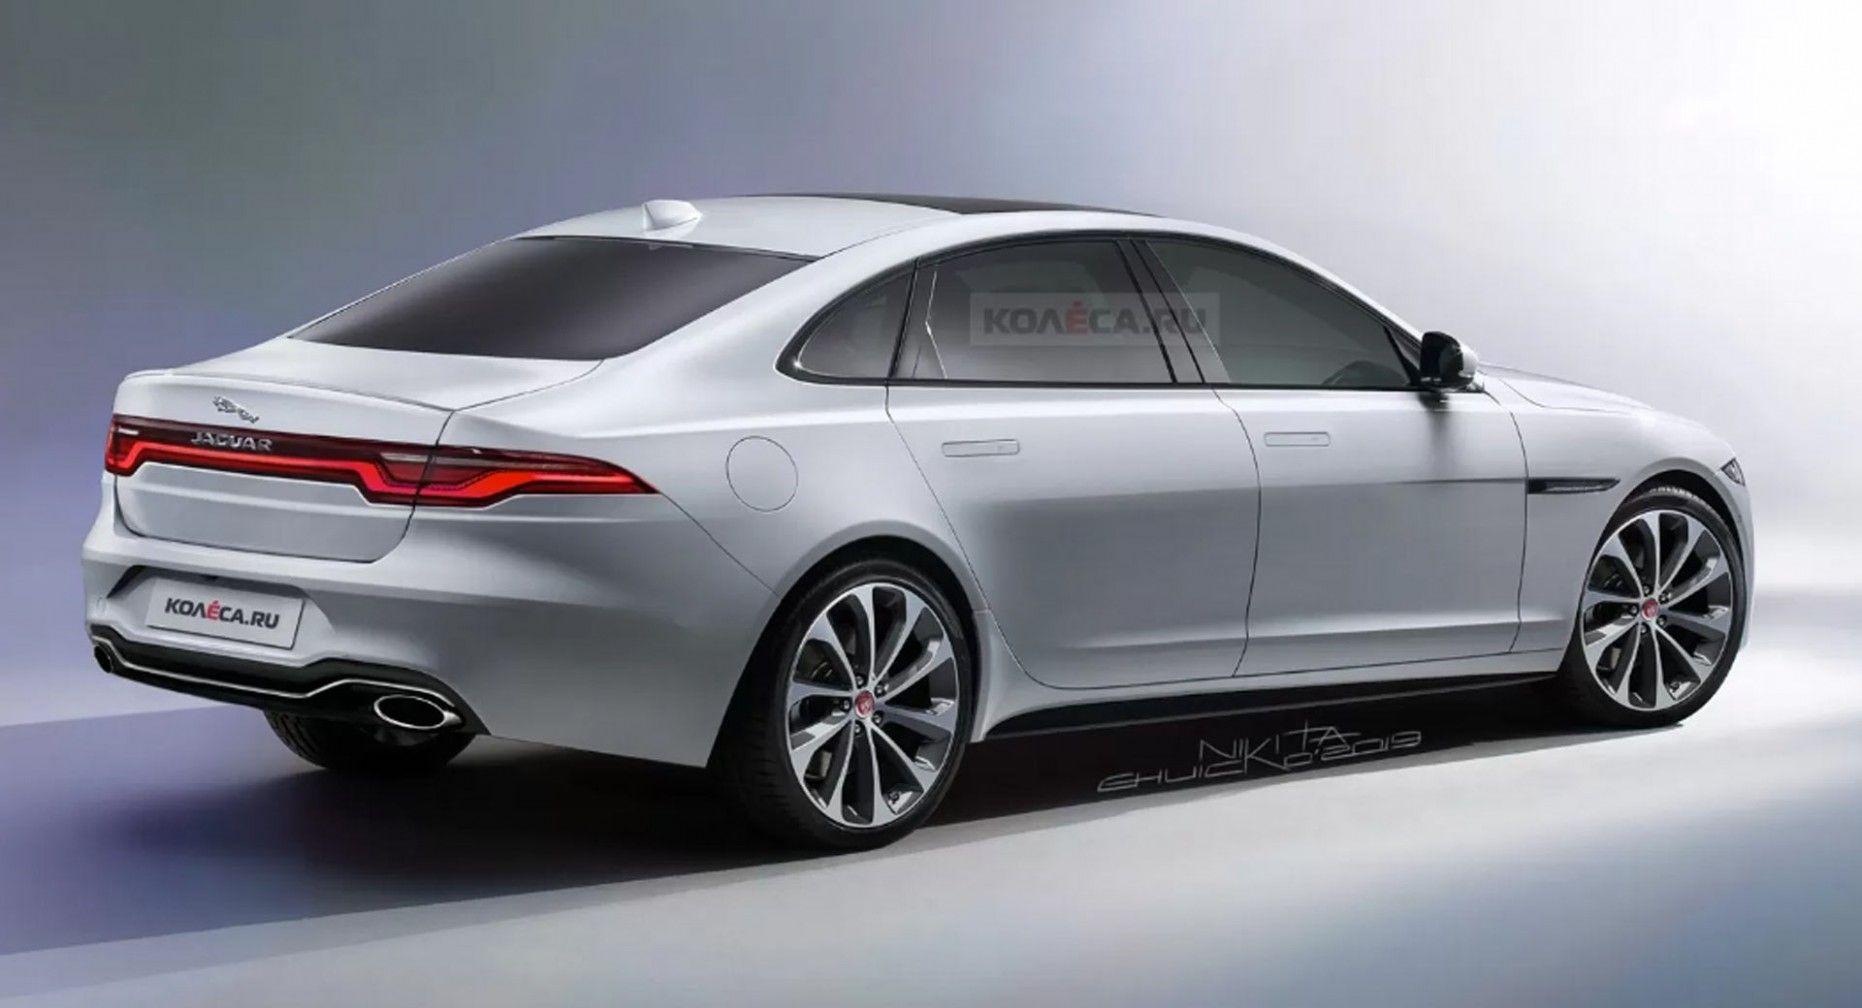 2021 Jaguar Xj Price And Release Date Jaguar Xj Jaguar Xe Jaguar